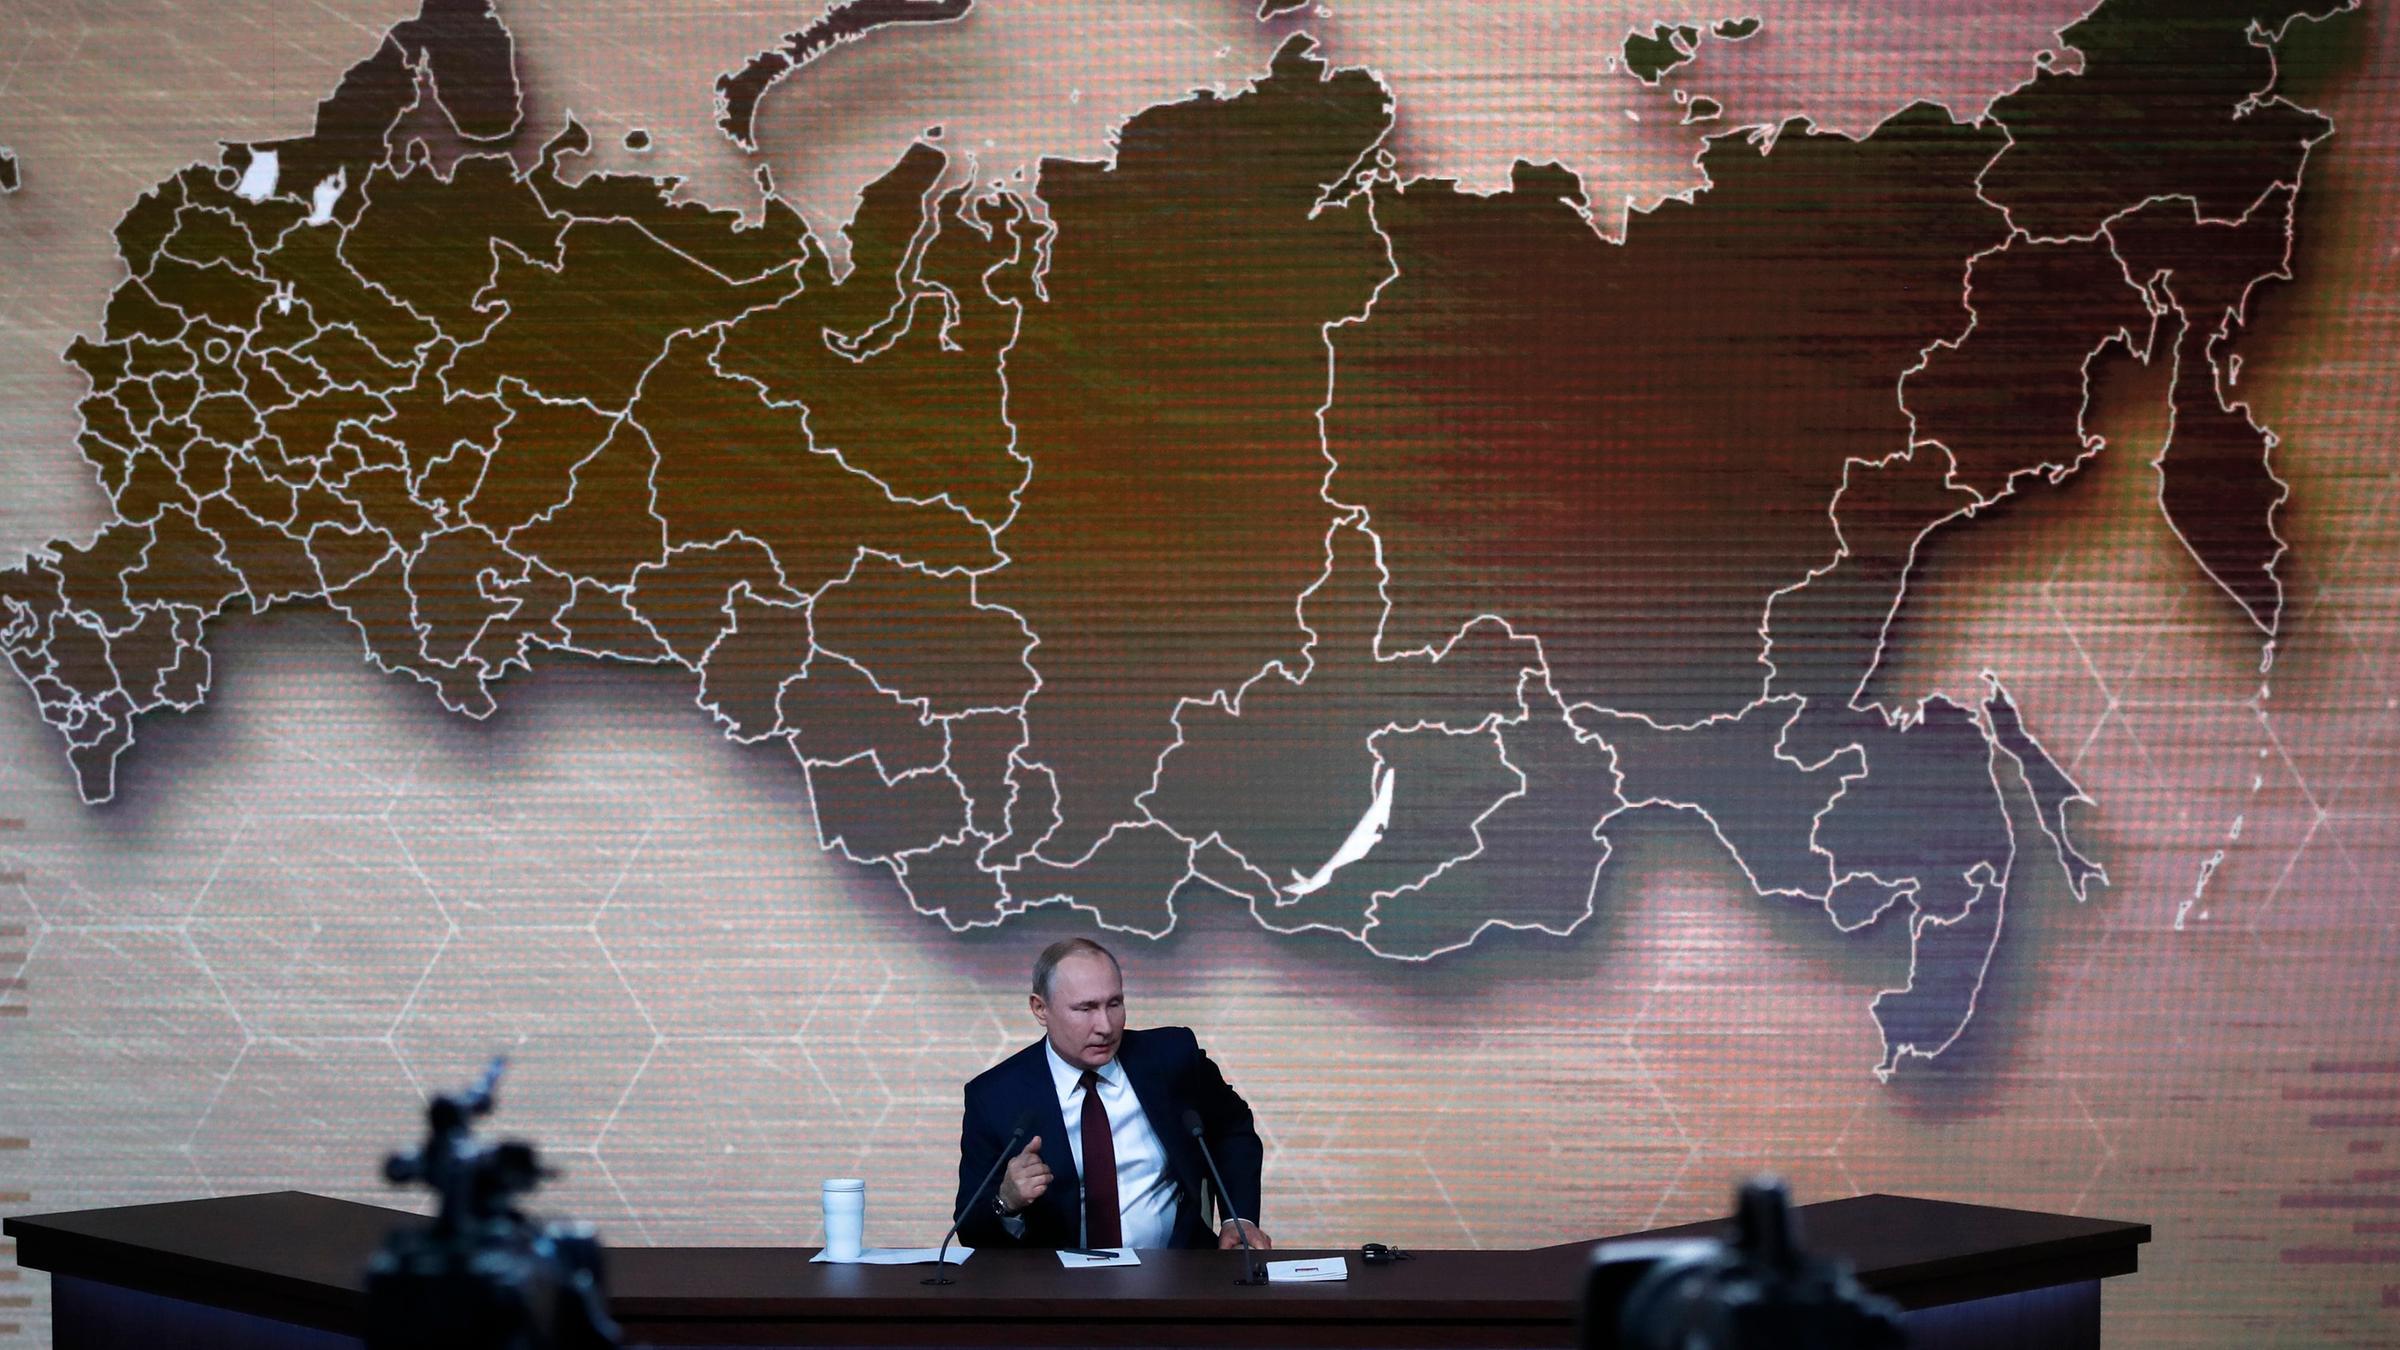 Hitler-Stalin-Pakt: Putin kritisiert Europaparlament - ZDFheute